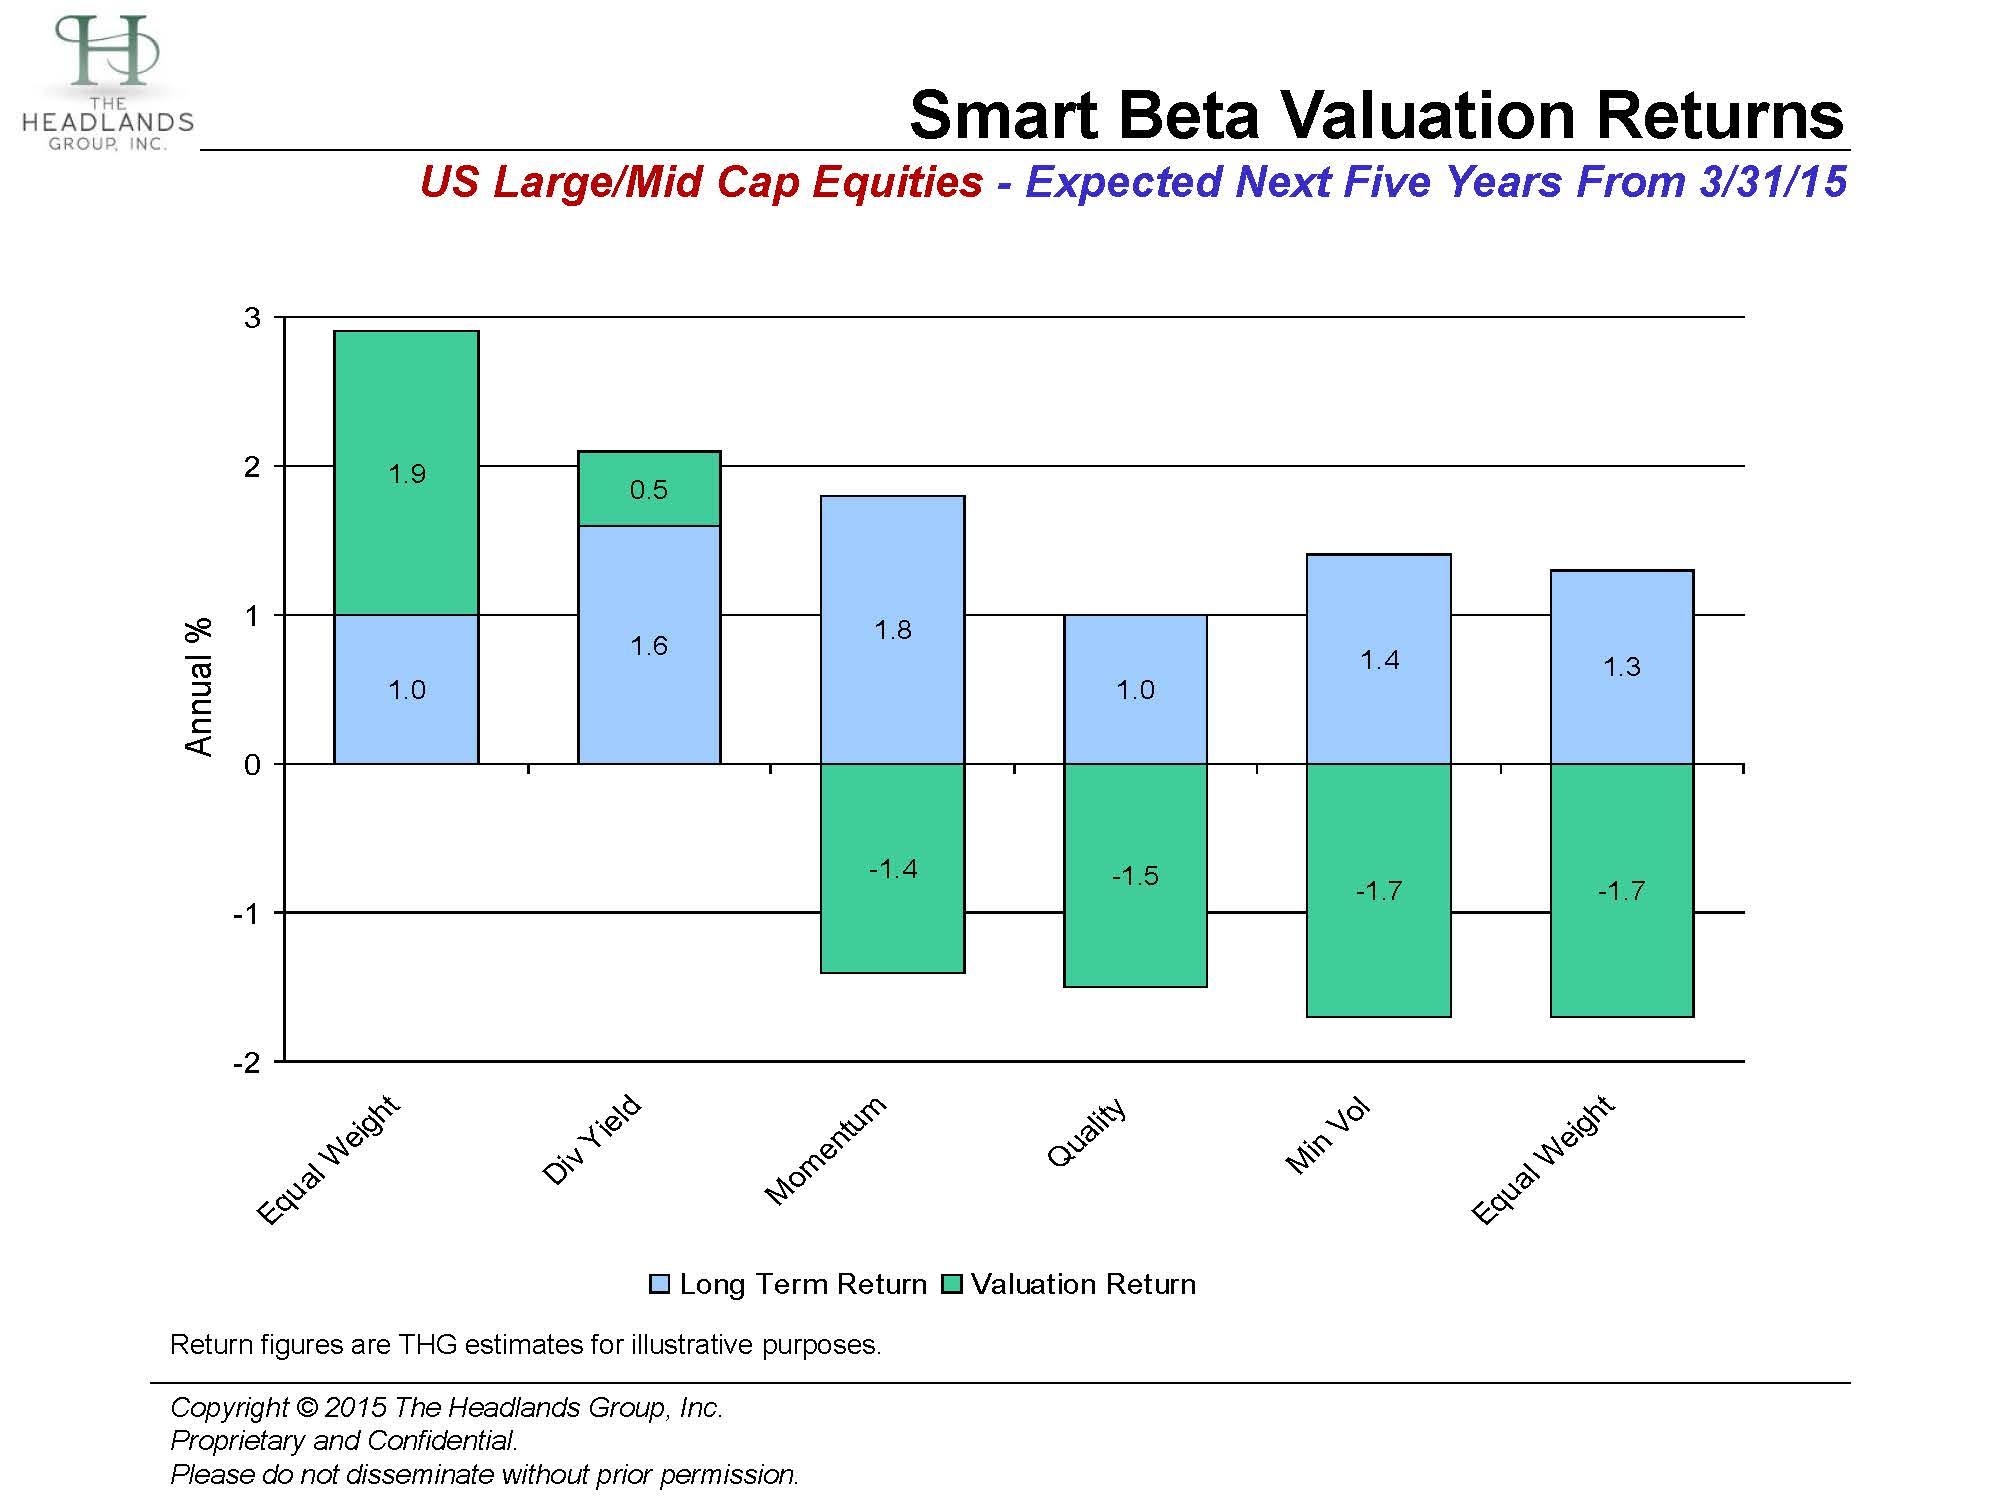 Smart Beta Valuations